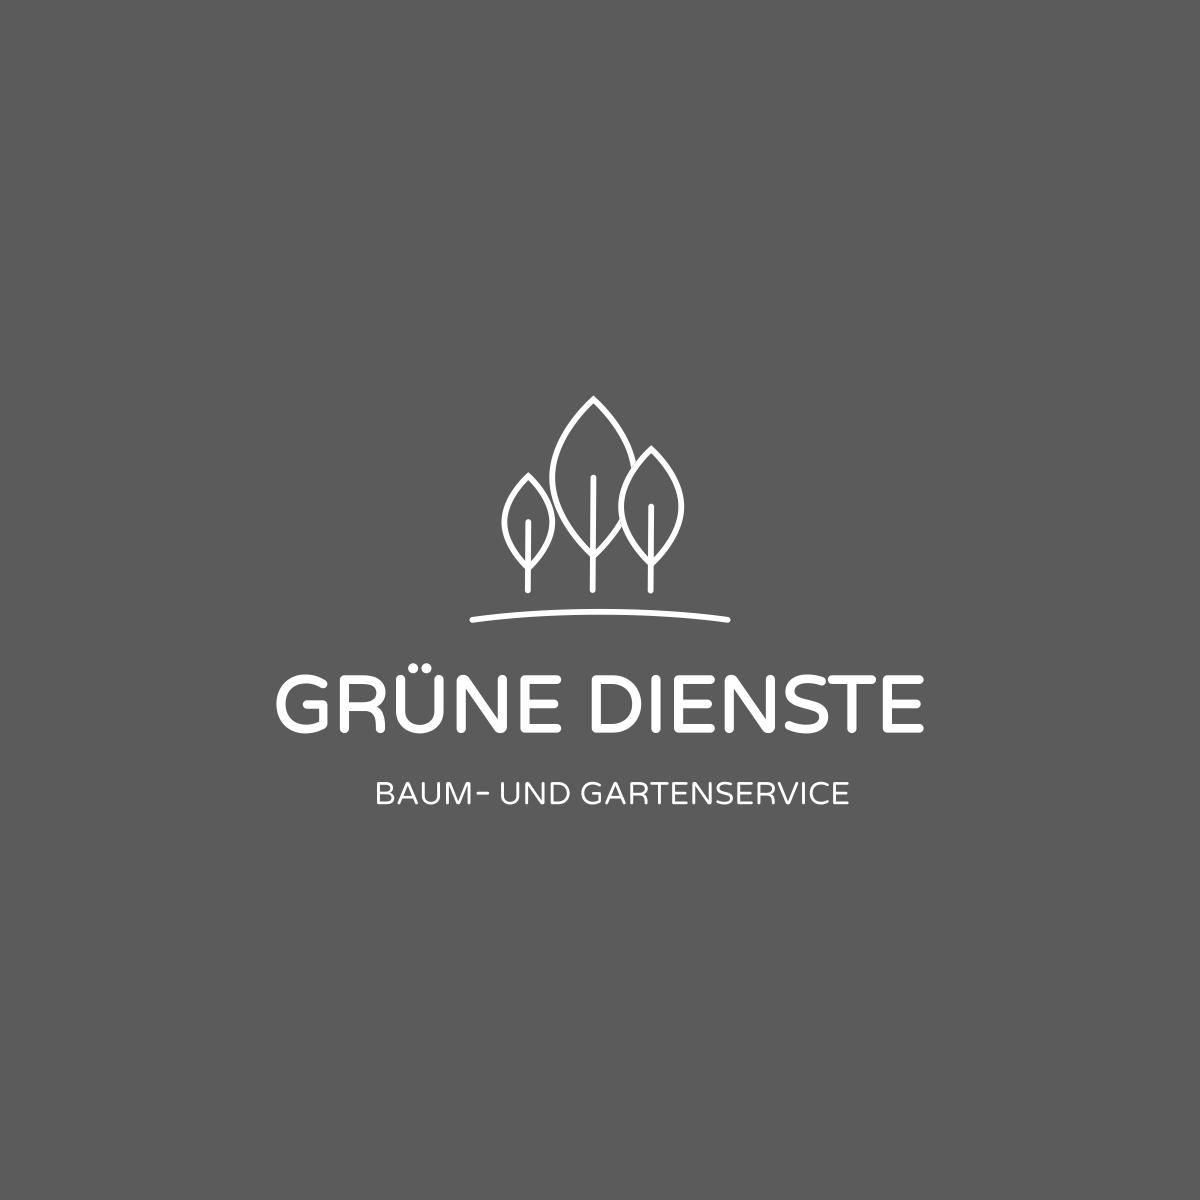 logo-design-gala-bau-baumpflege-baumkletterer-gruene-diente-b-w